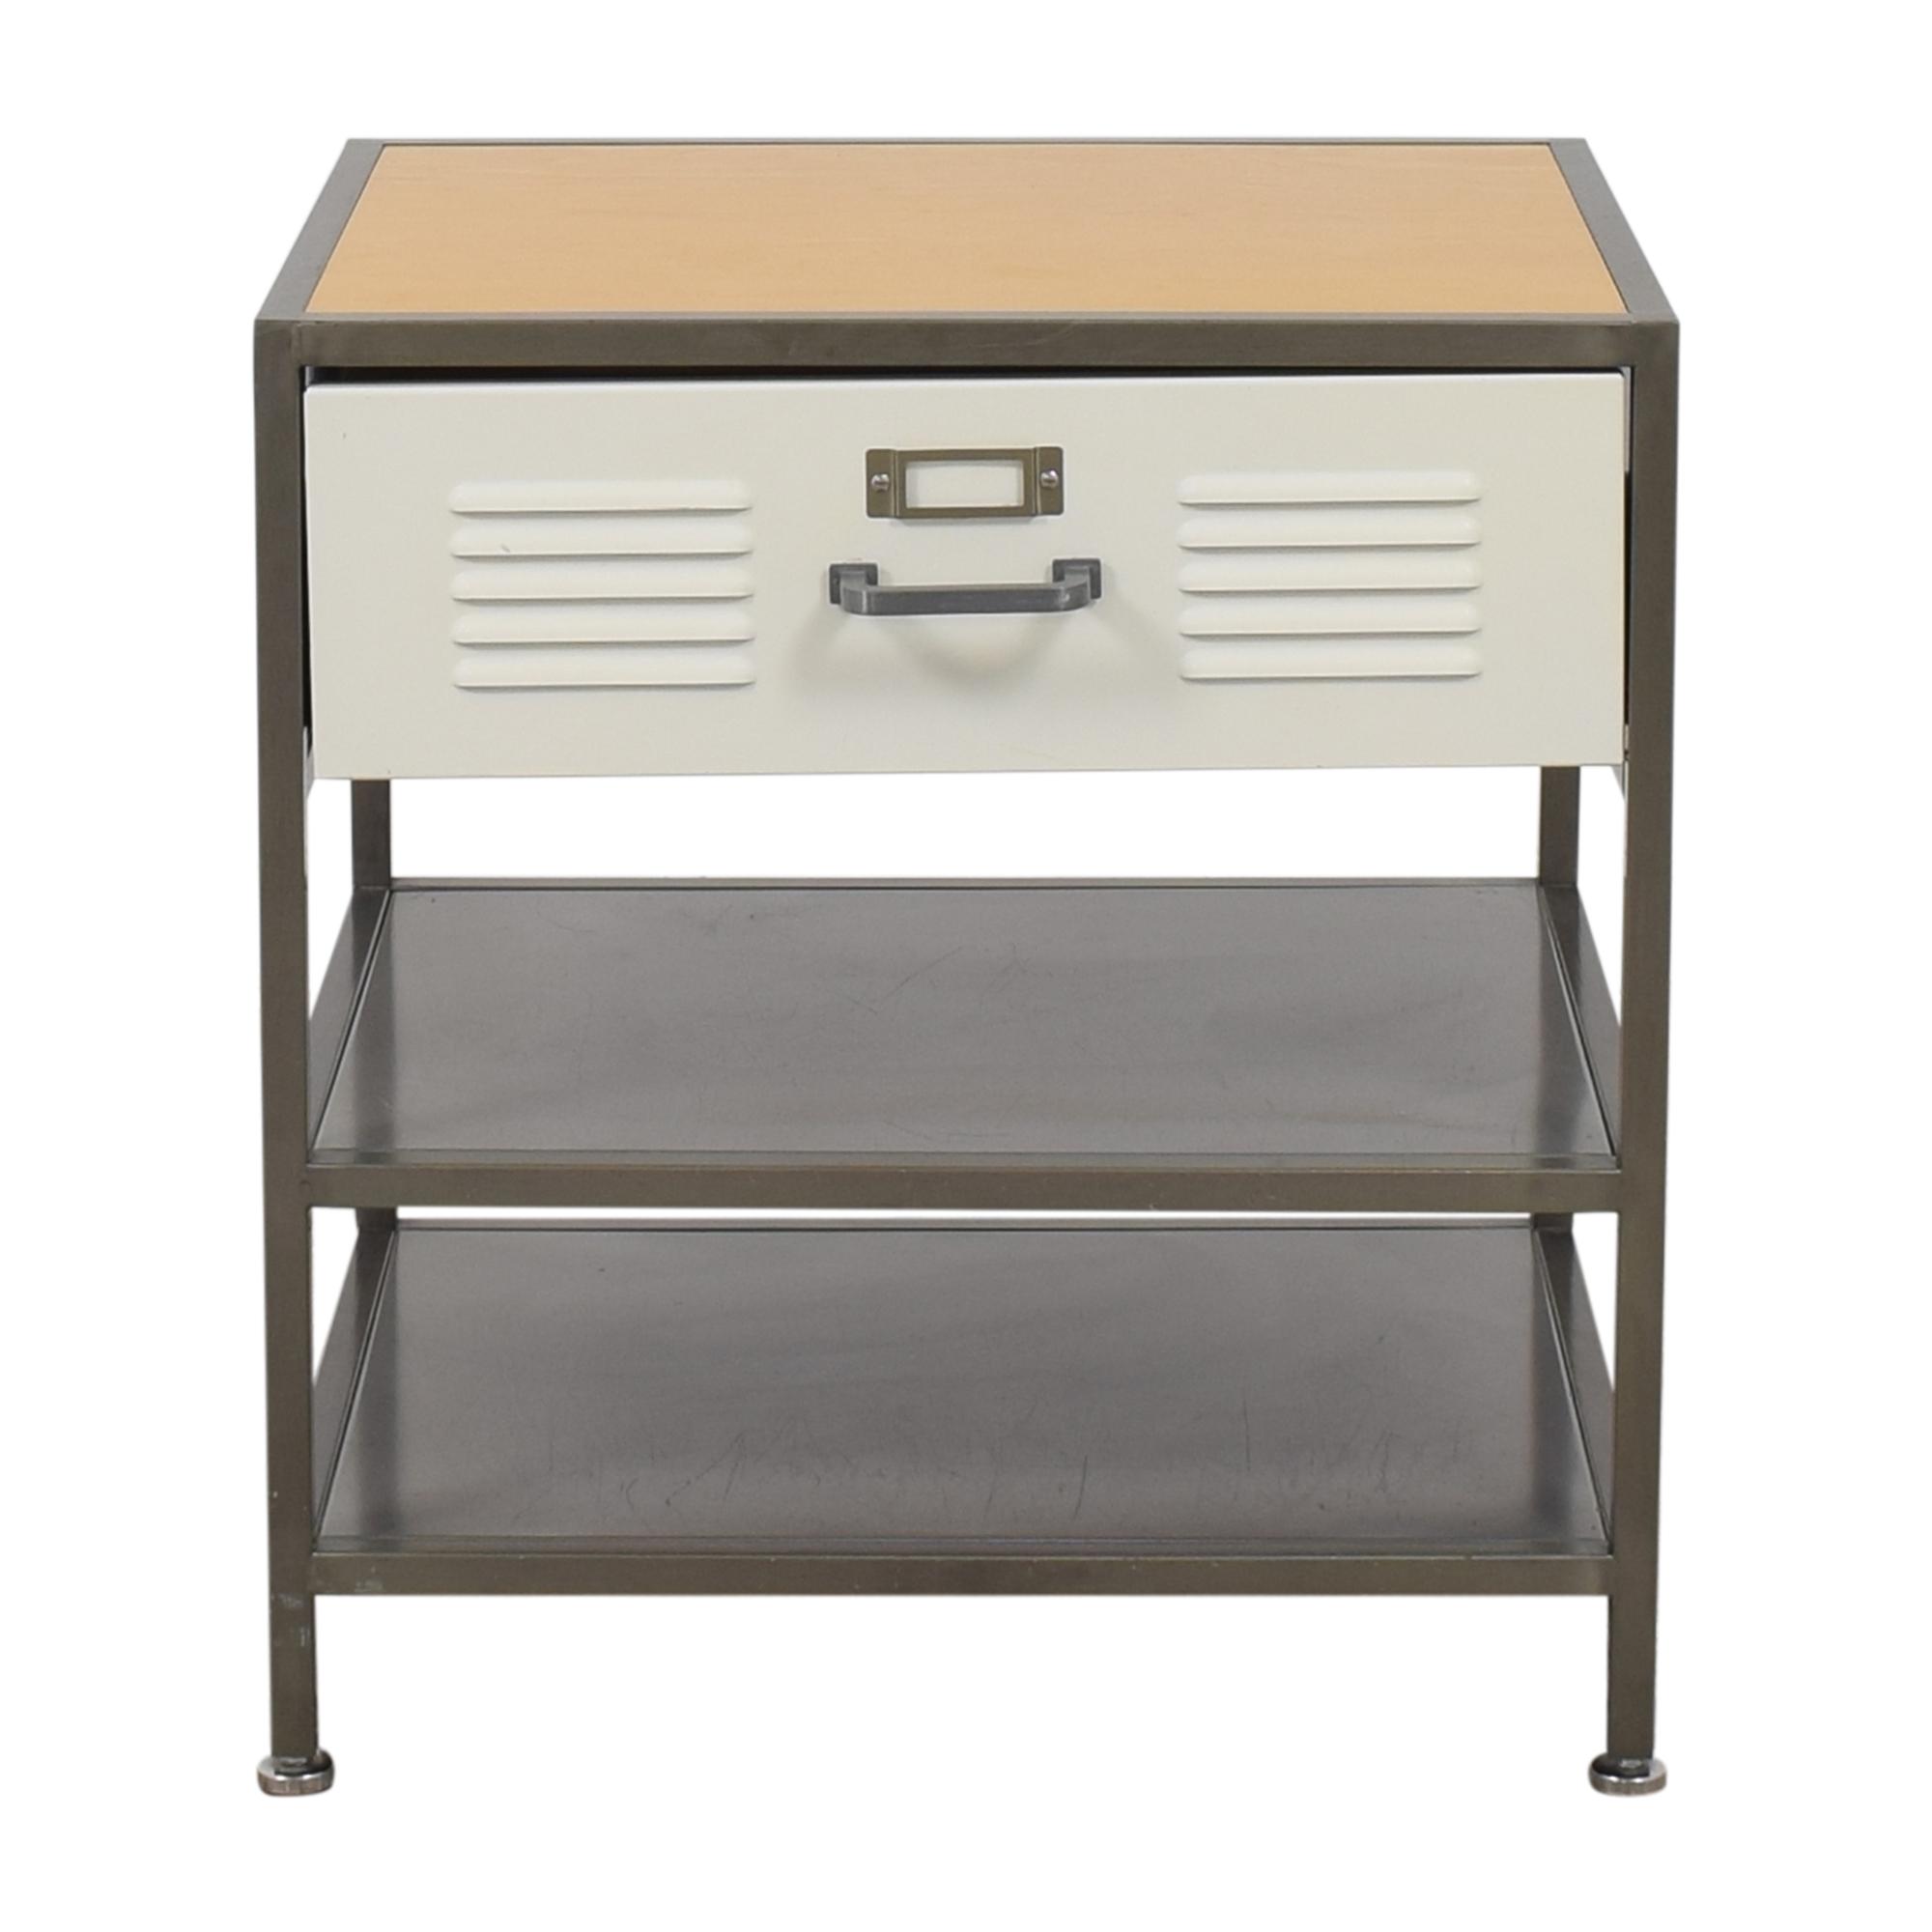 Pottery Barn Teen Pottery Barn Teen Drawer Locker Table/Nightstand End Tables